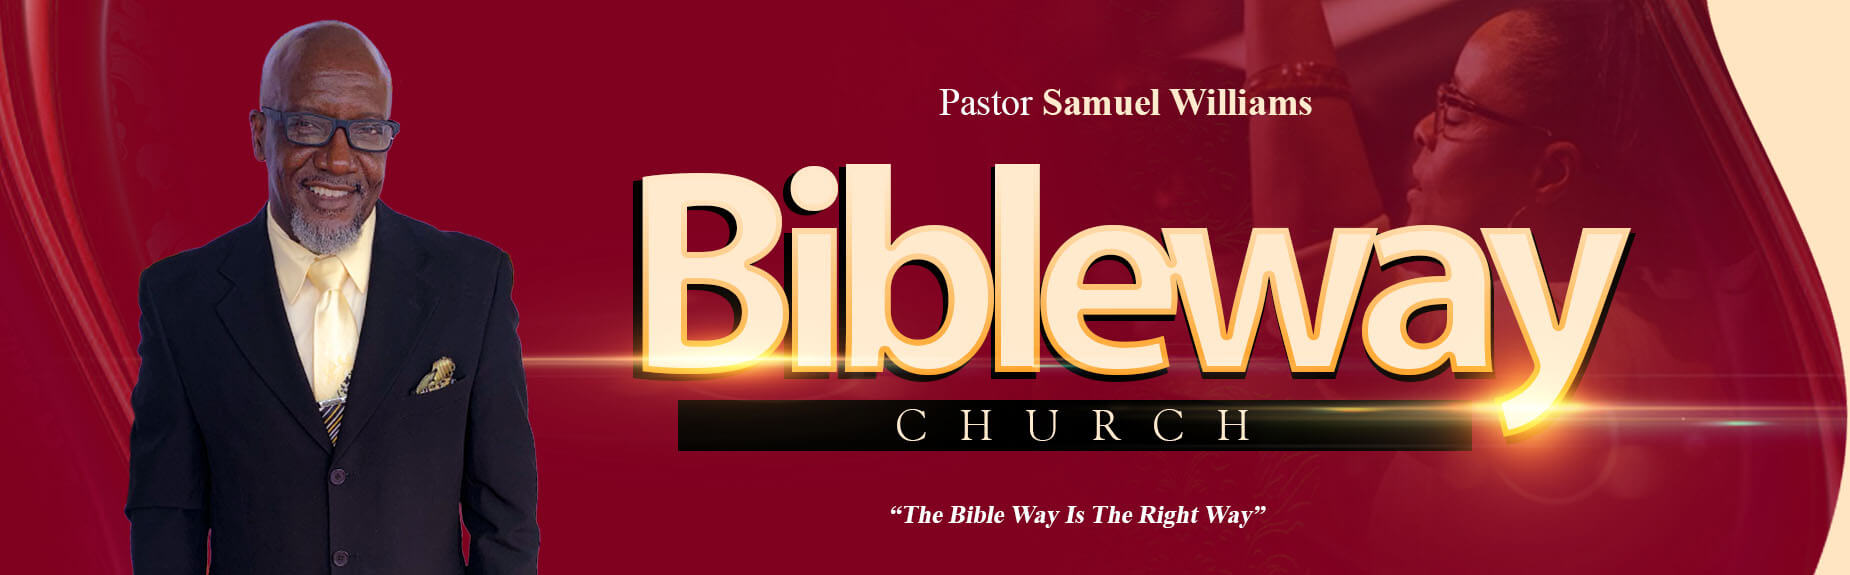 Bibleway Apostolic Church Banner